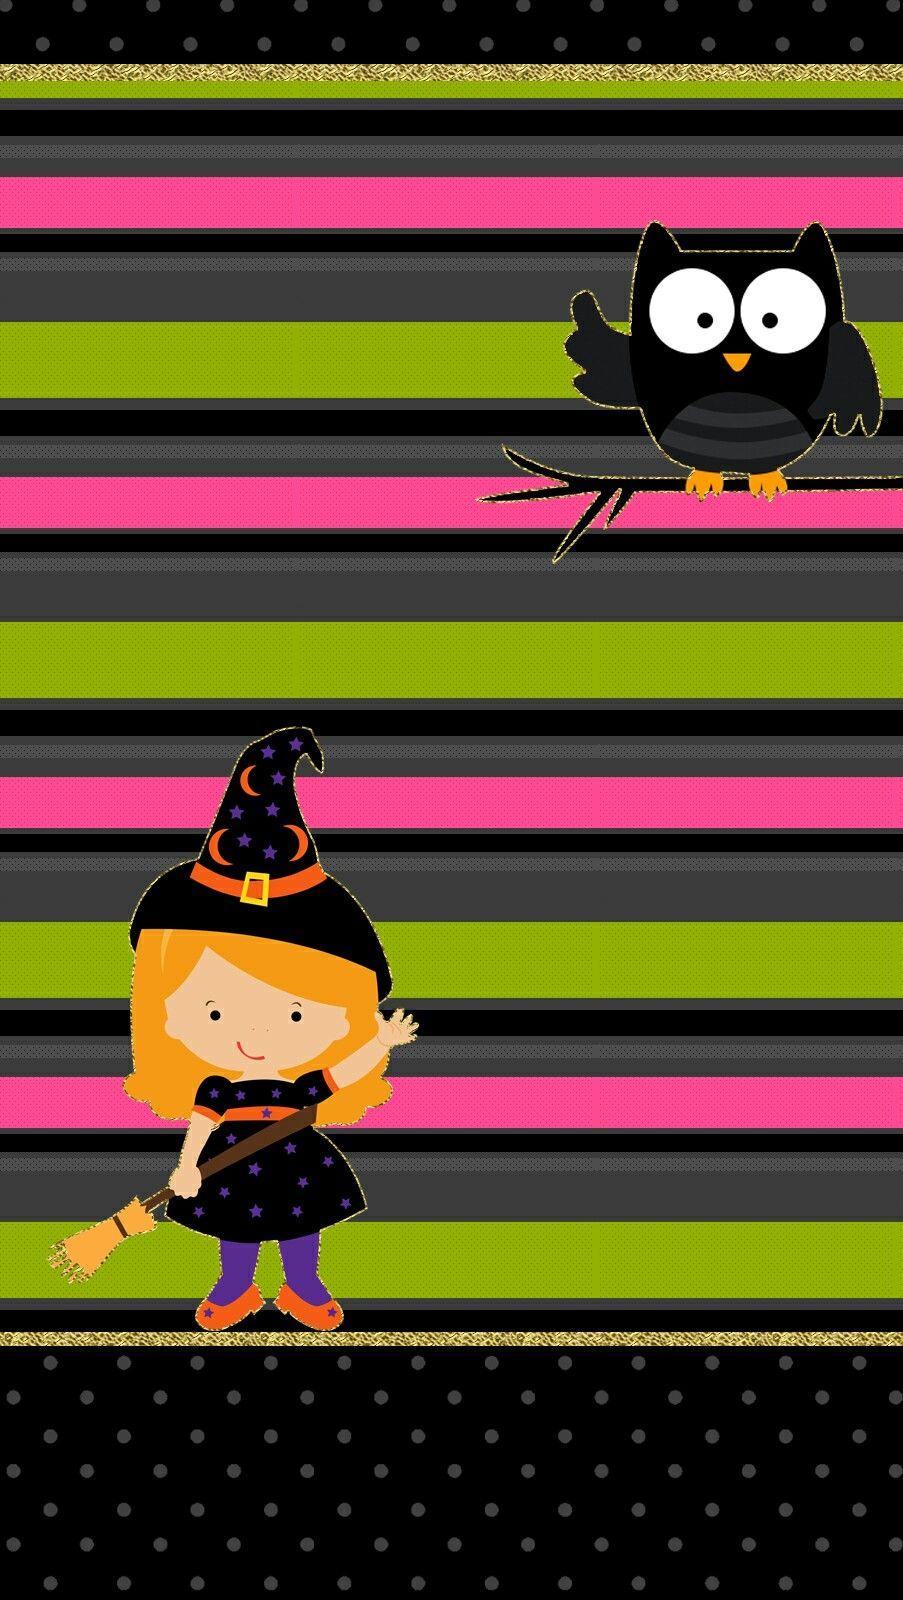 Fantastic Wallpaper Halloween Home Screen - fd4dac6b2539089aafa6ba107290daa6  2018_933017.jpg